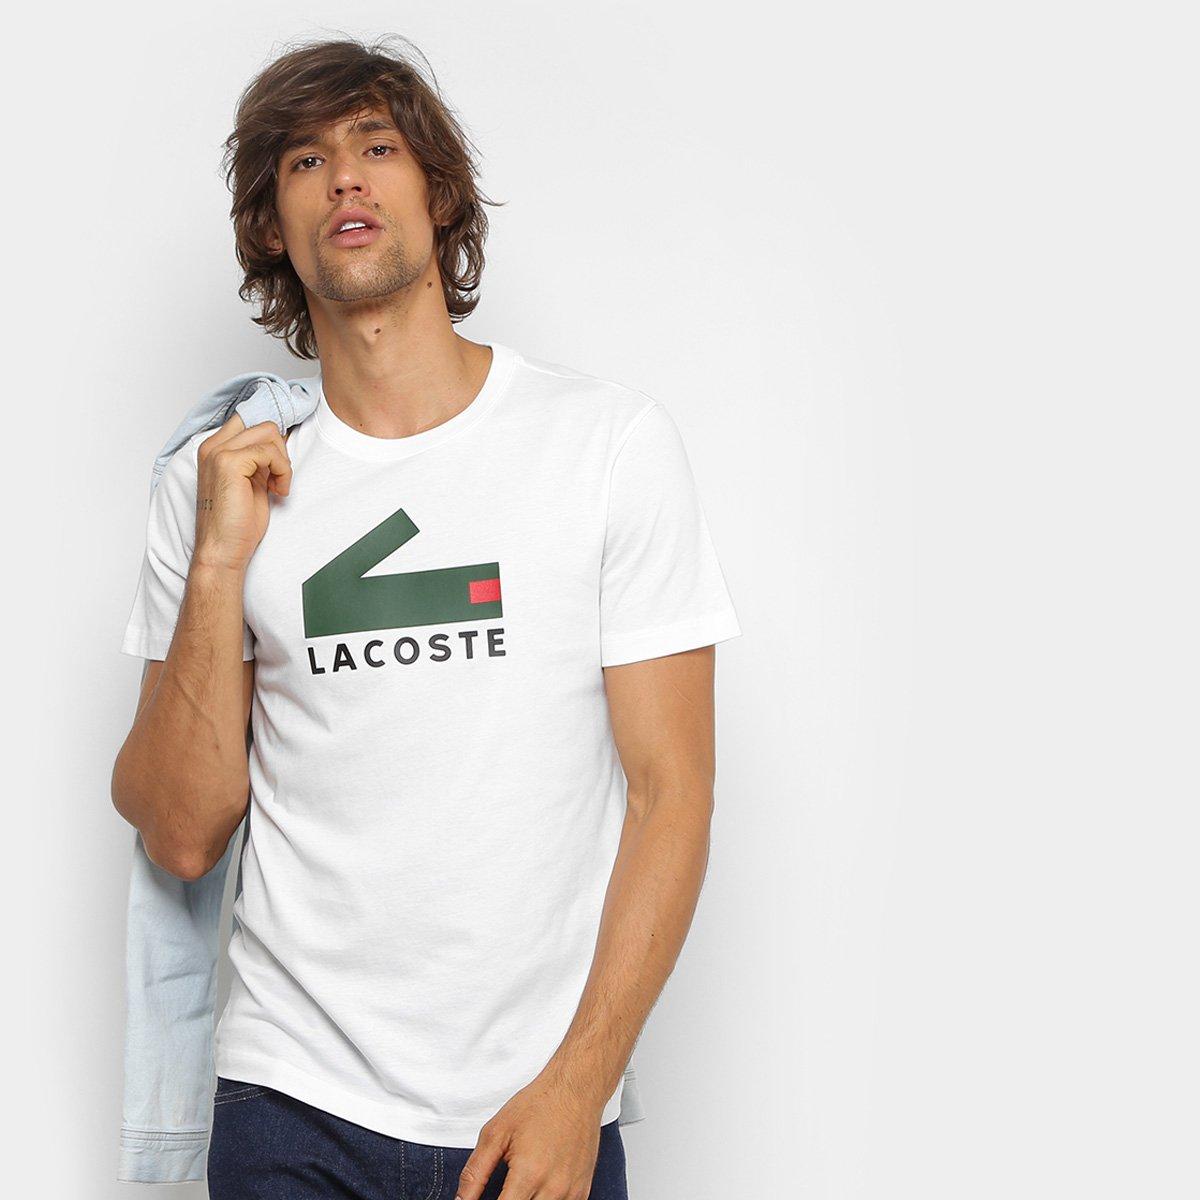 7dc9b4ac299db Camiseta Lacoste New Croco Masculina - Compre Agora